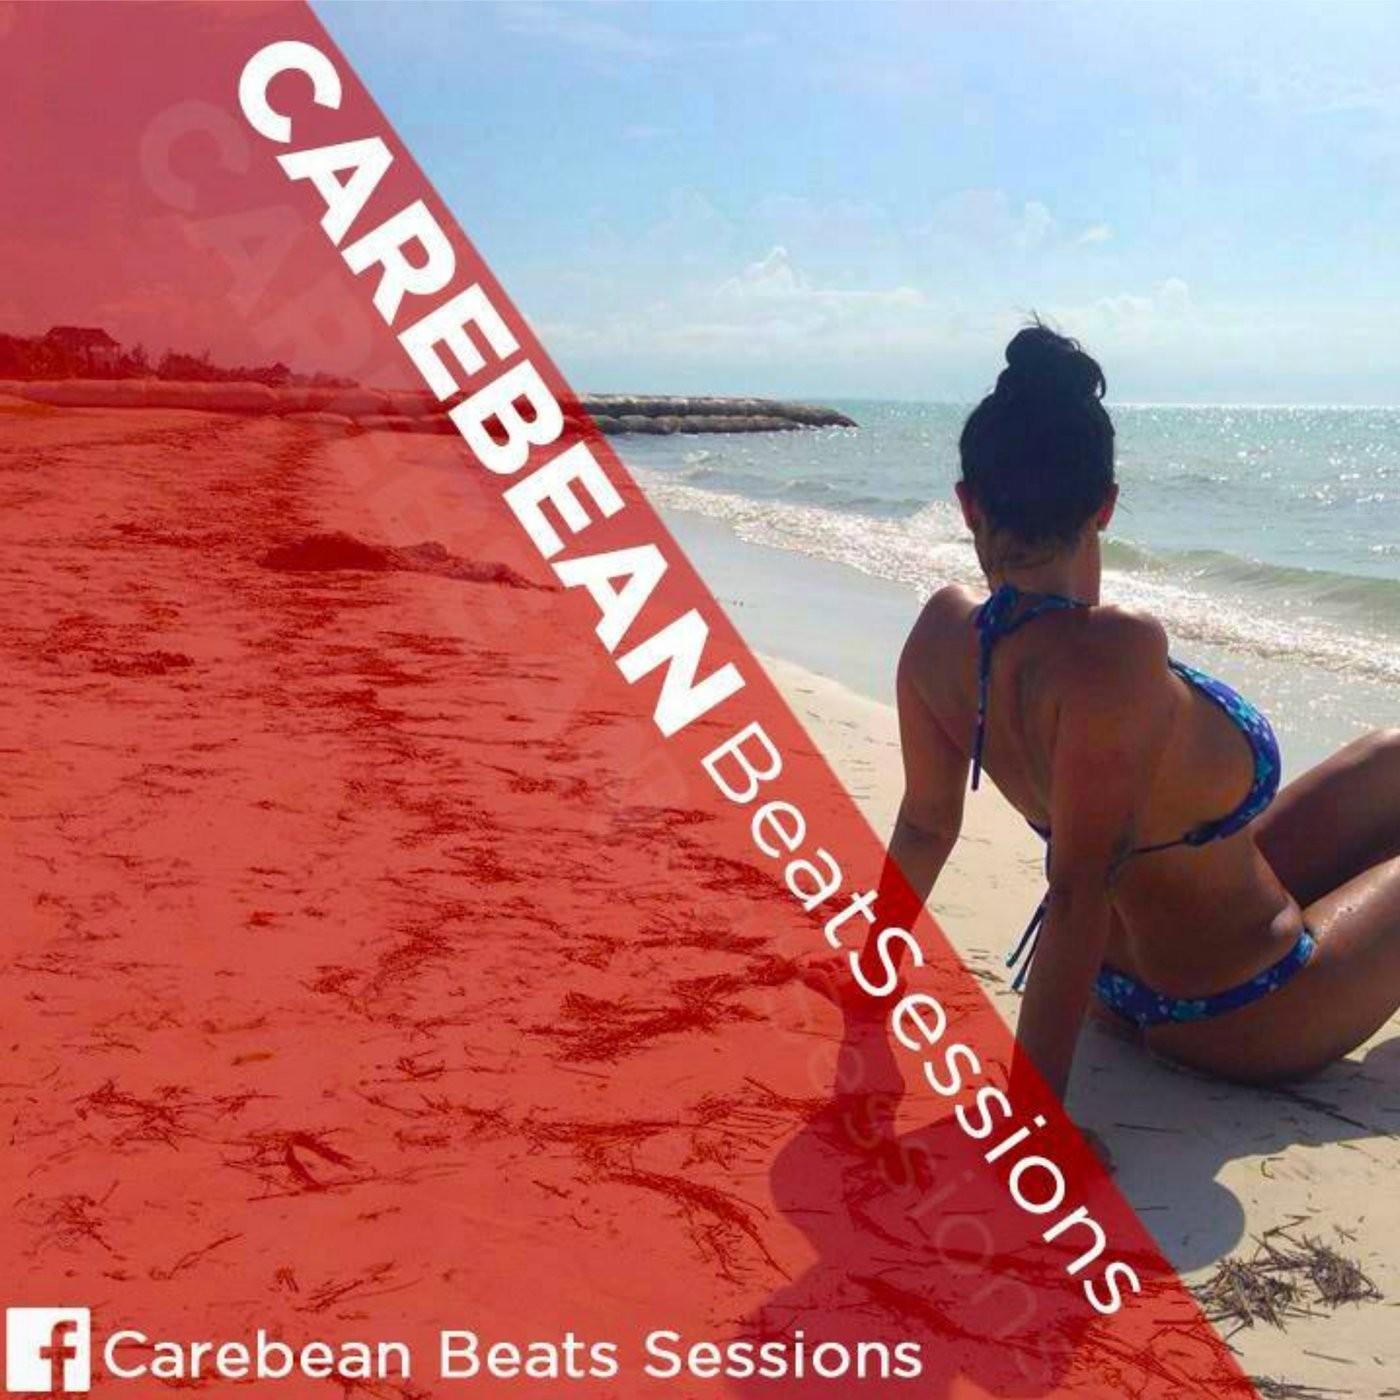 <![CDATA[Carebean Beats Sessions]]>